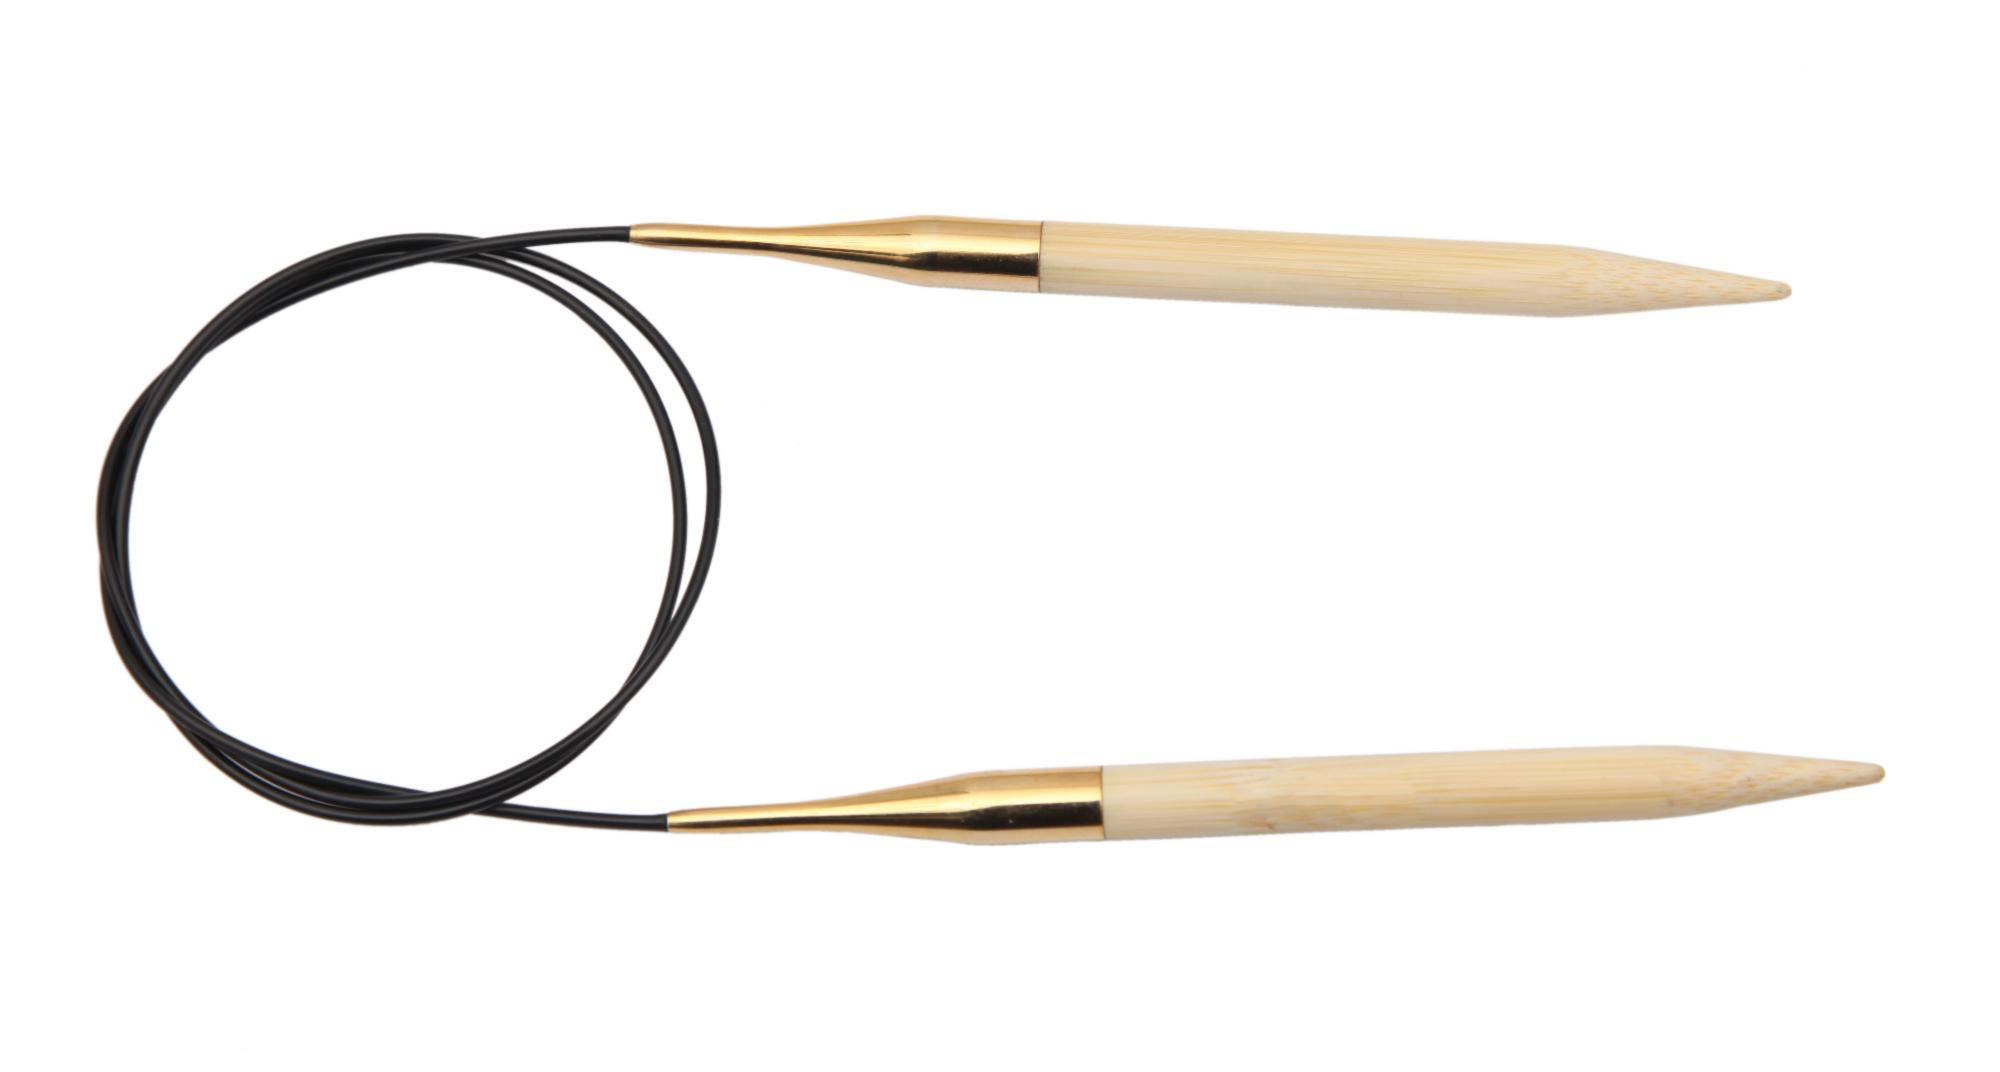 Спицы круговые 100 см Bamboo KnitPro, 22271, 6.00 мм